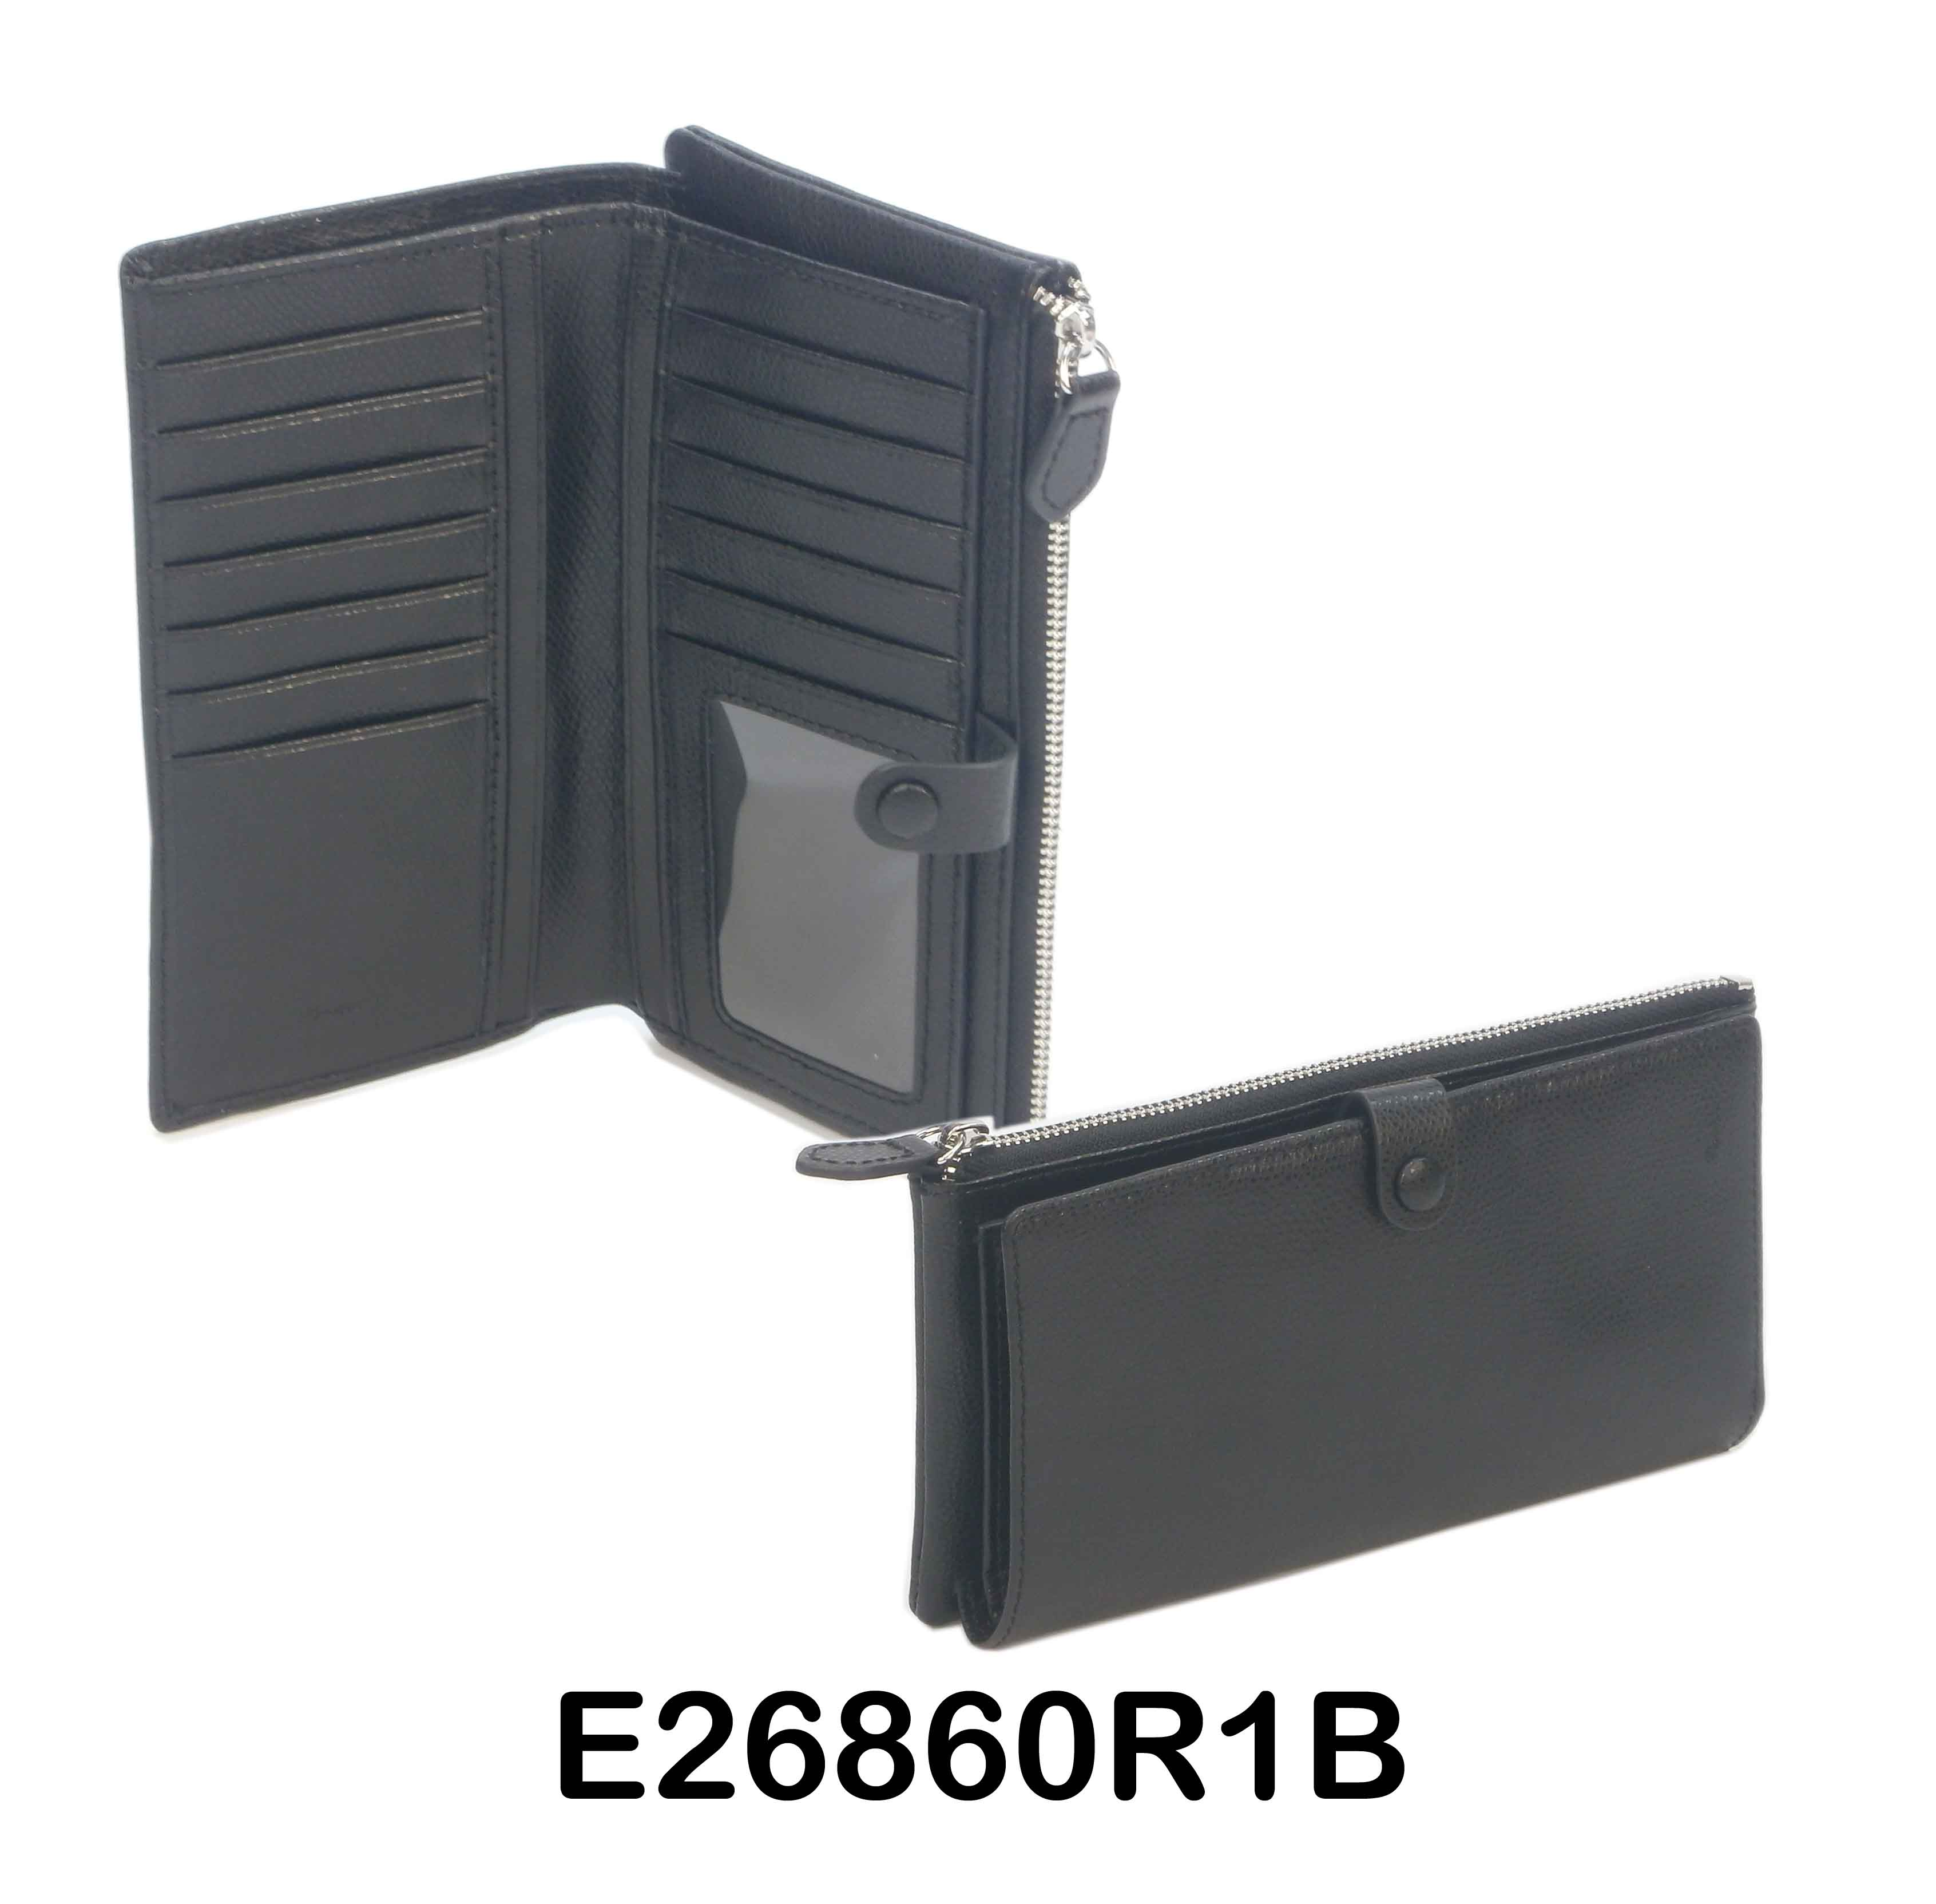 E26860R1B whole